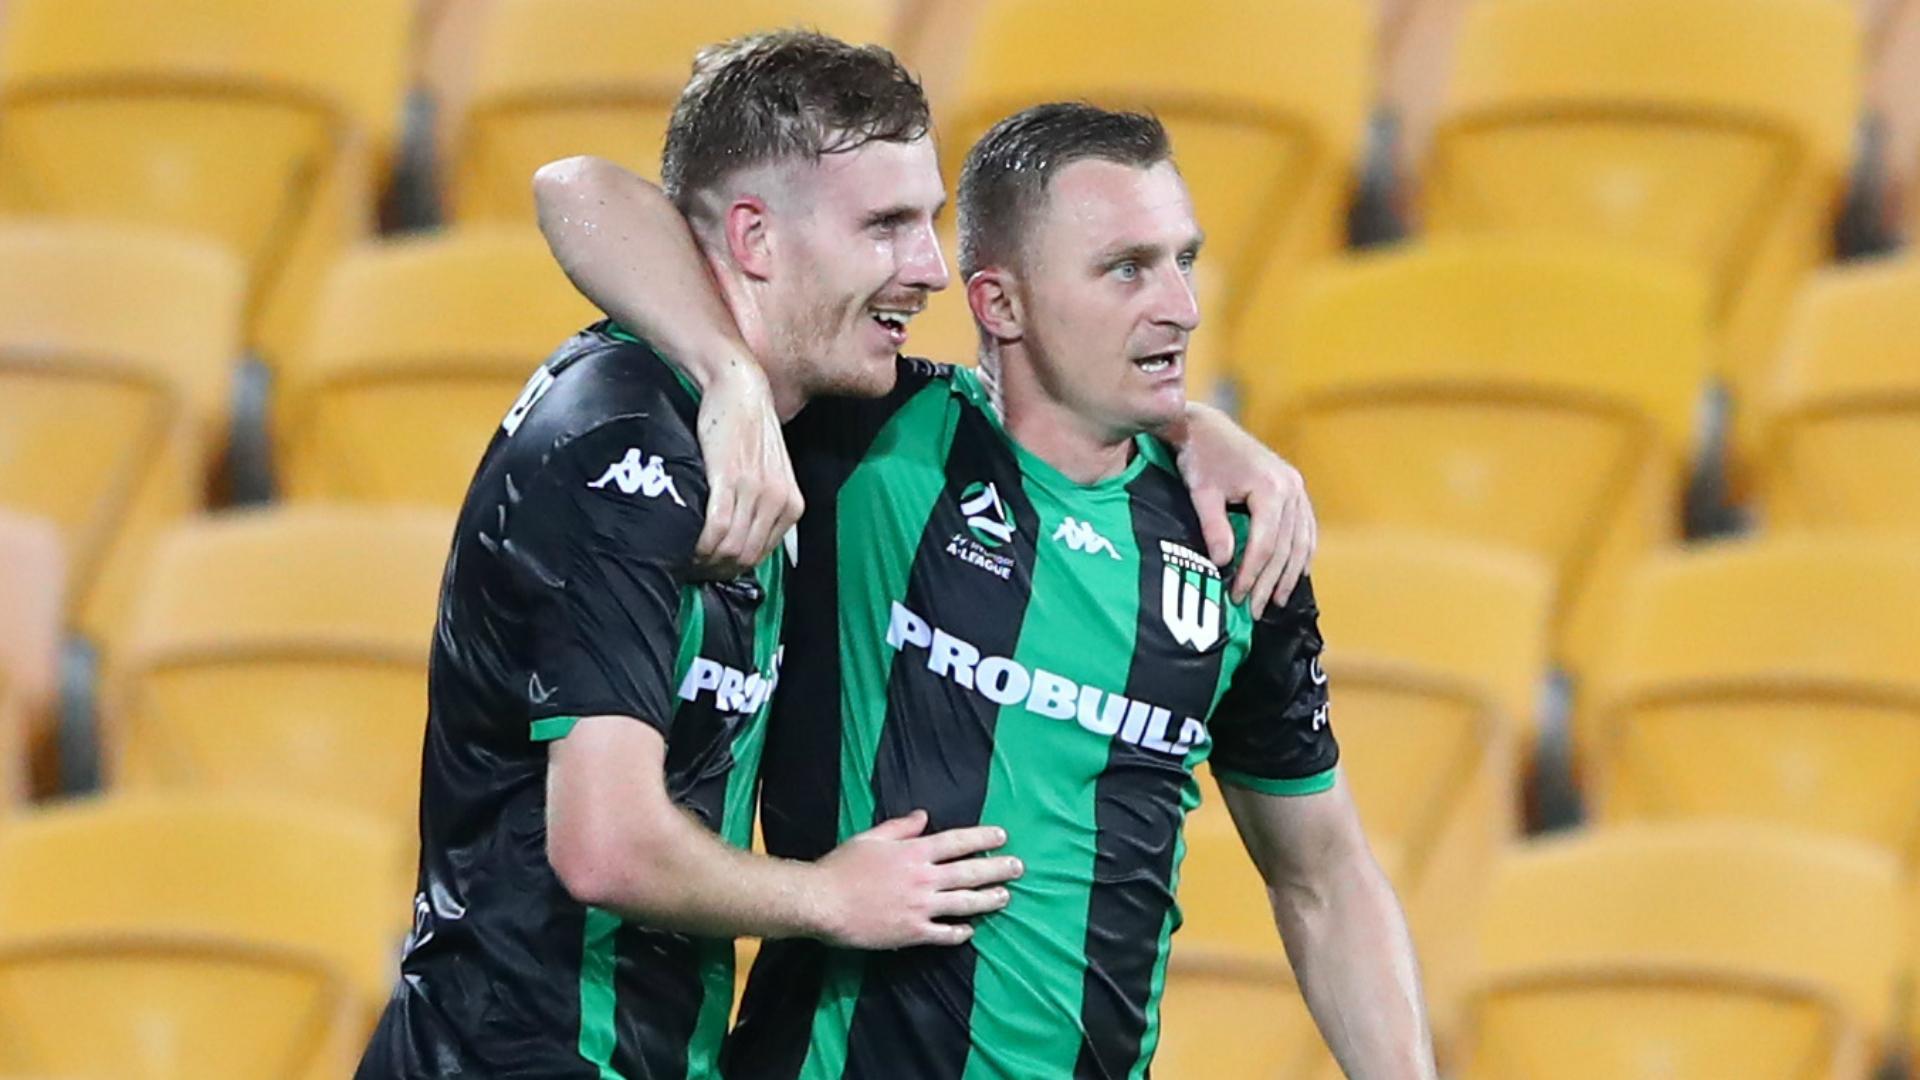 Brisbane Roar 0-2 Western United: Berisha on target as Fowler's men sink further into the mire